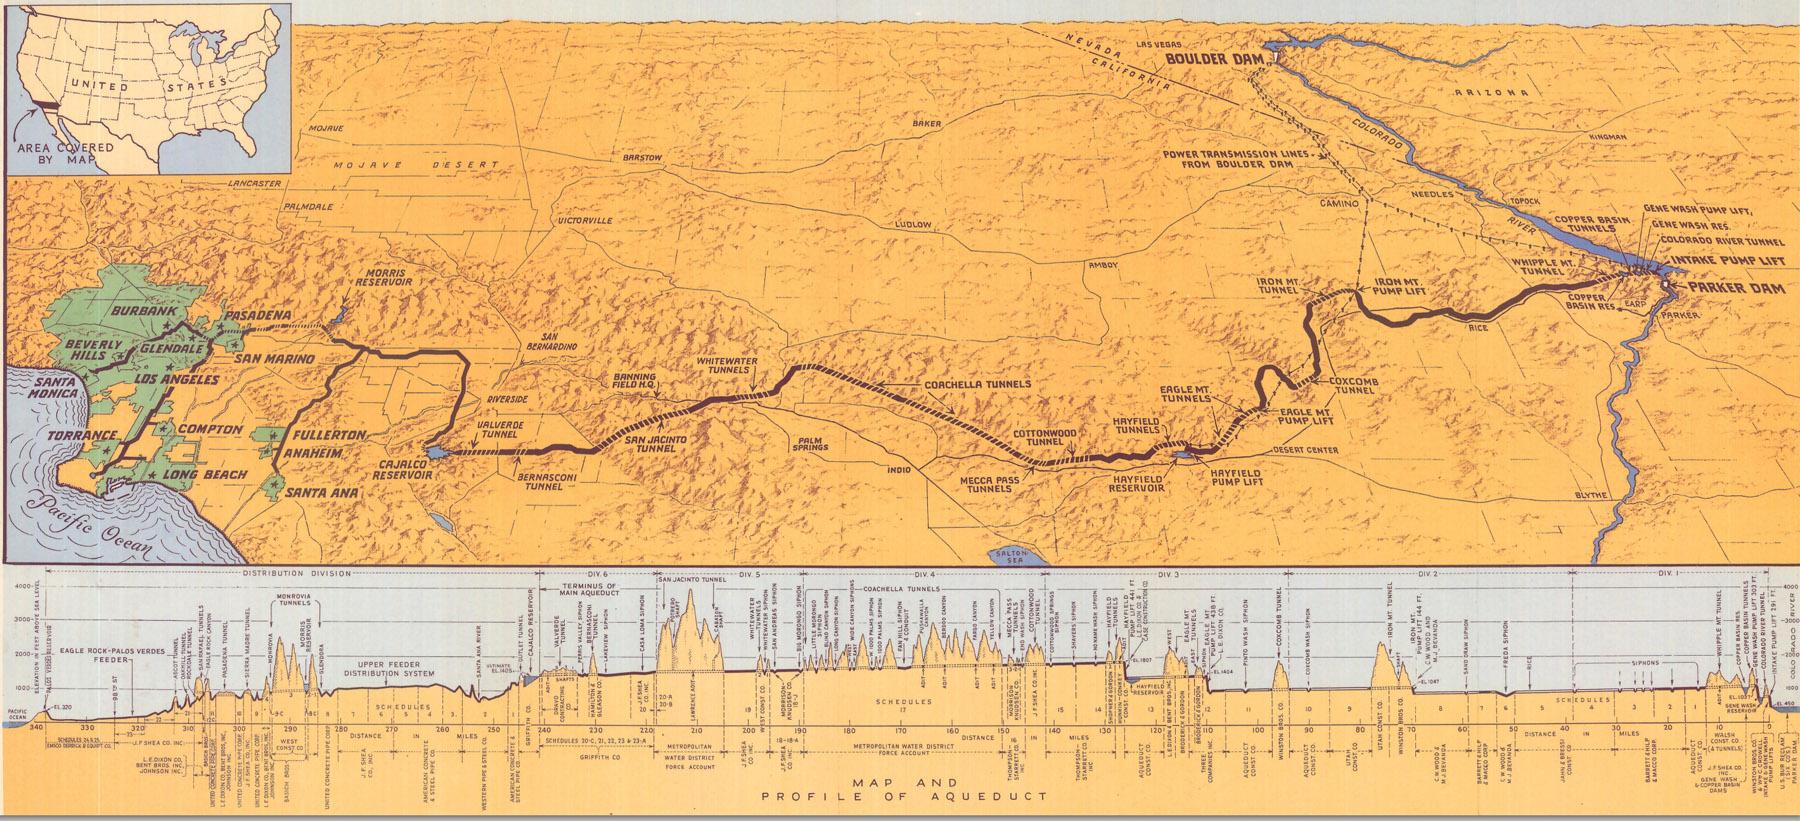 Colorado-River-Aqueduct-Map small.jpg